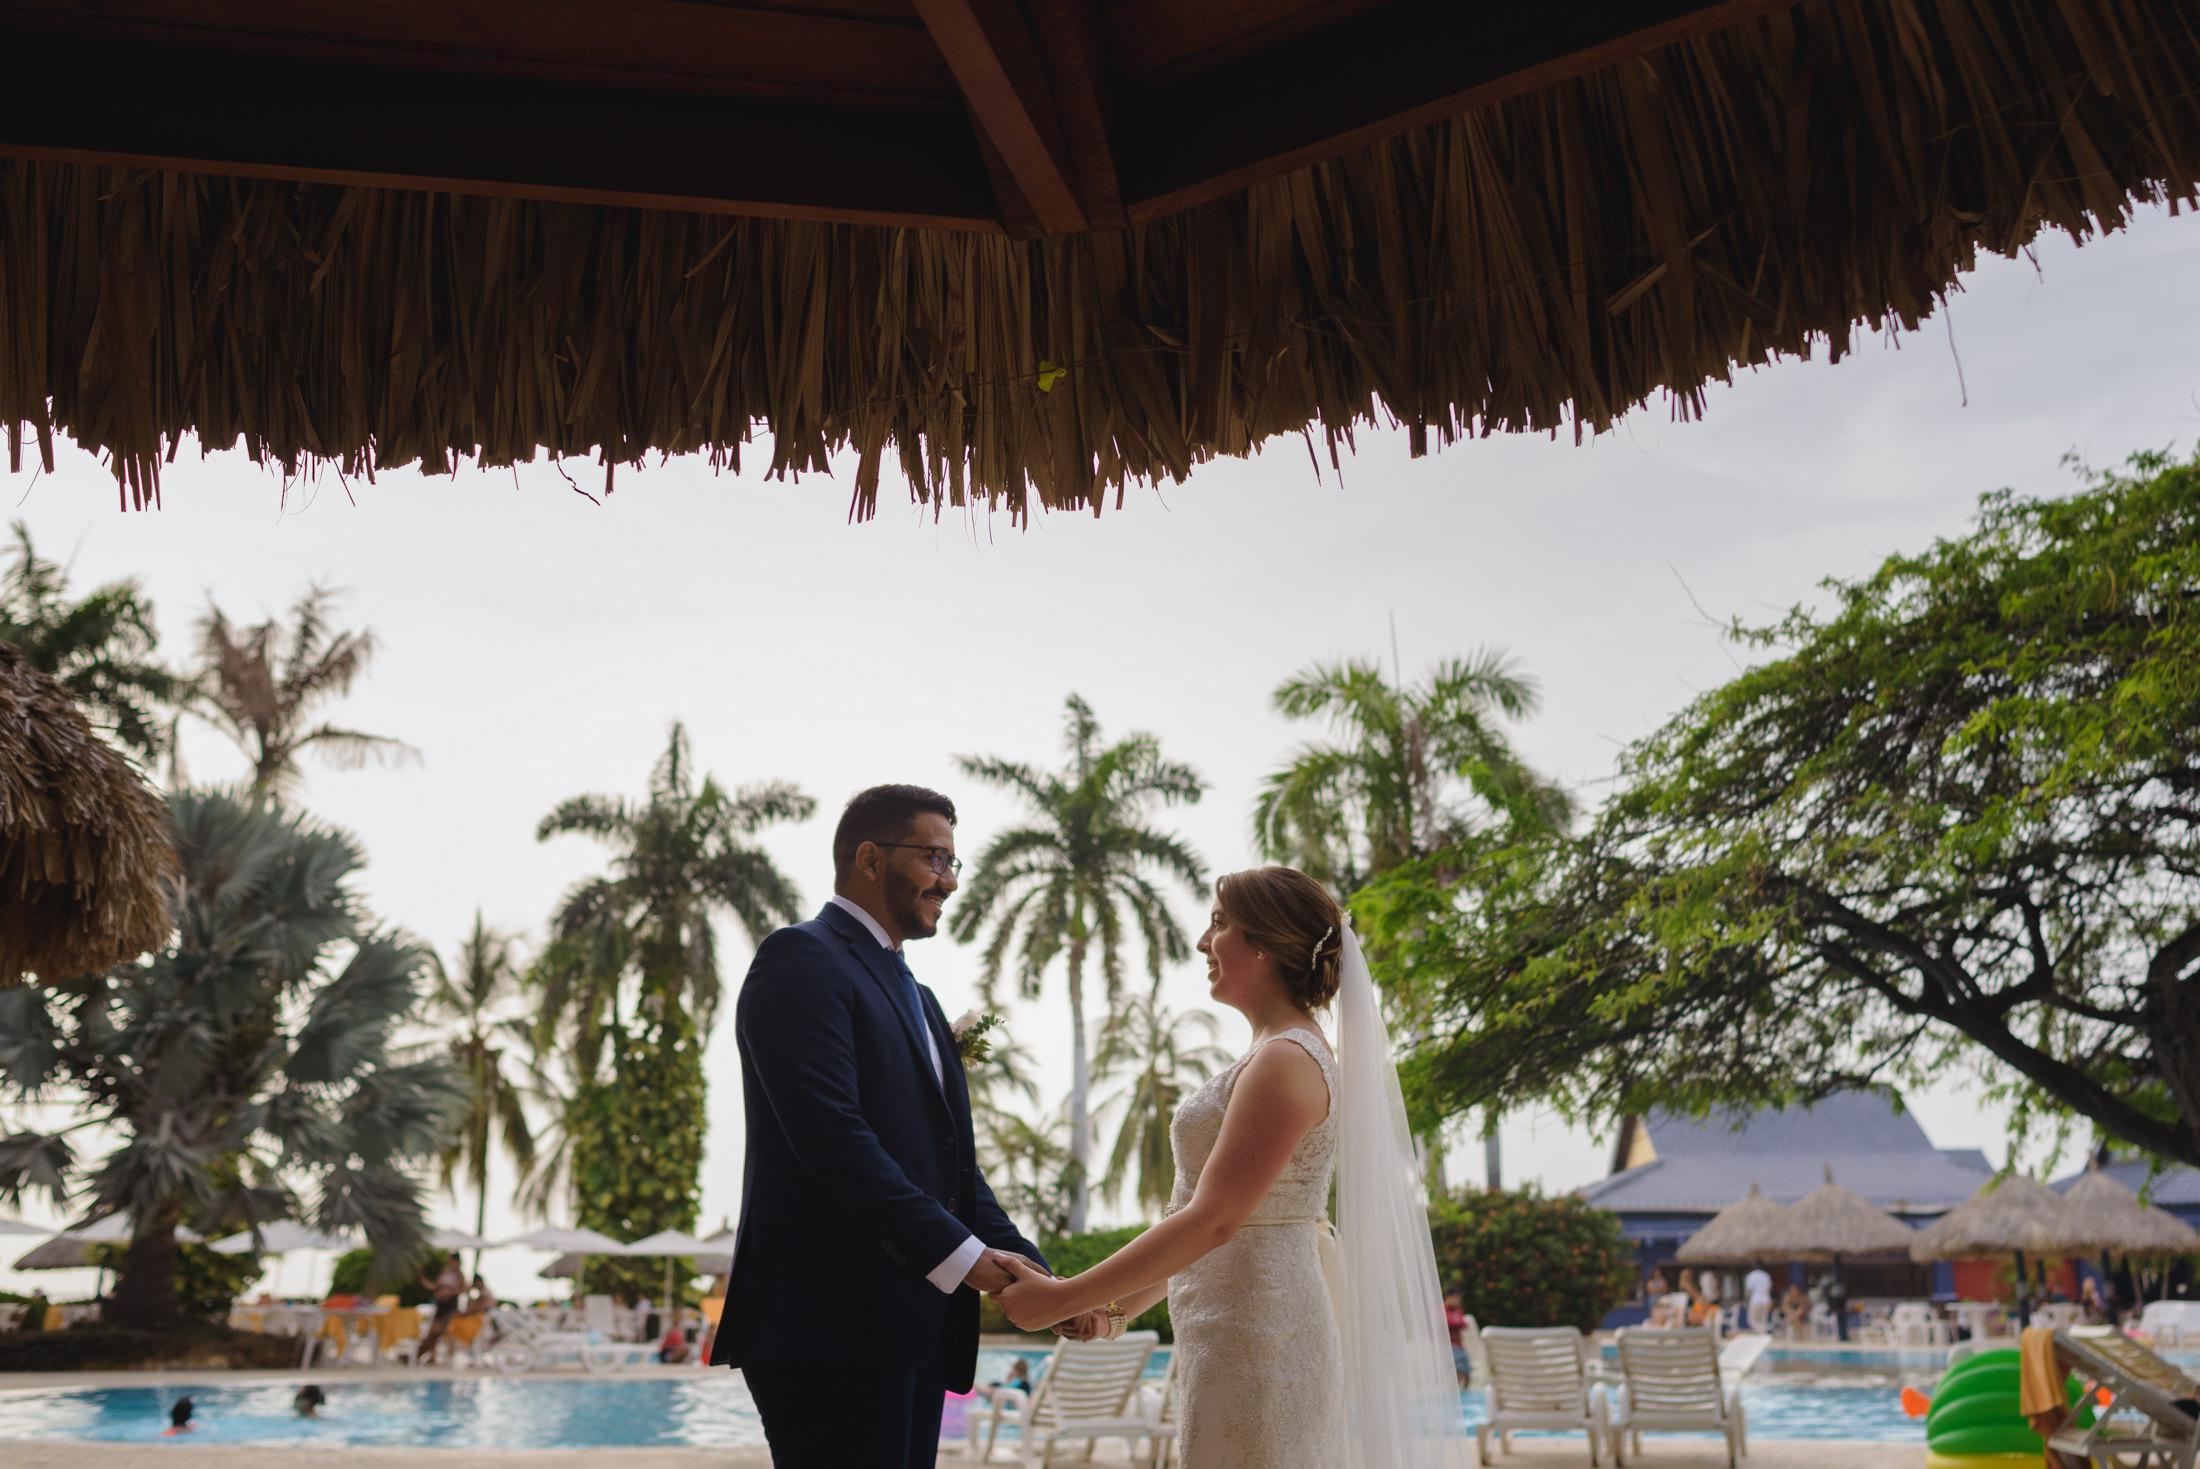 Matrimonio Simbólico Santa Marta : Mejores fotos de la boda alyssa andres santa marta